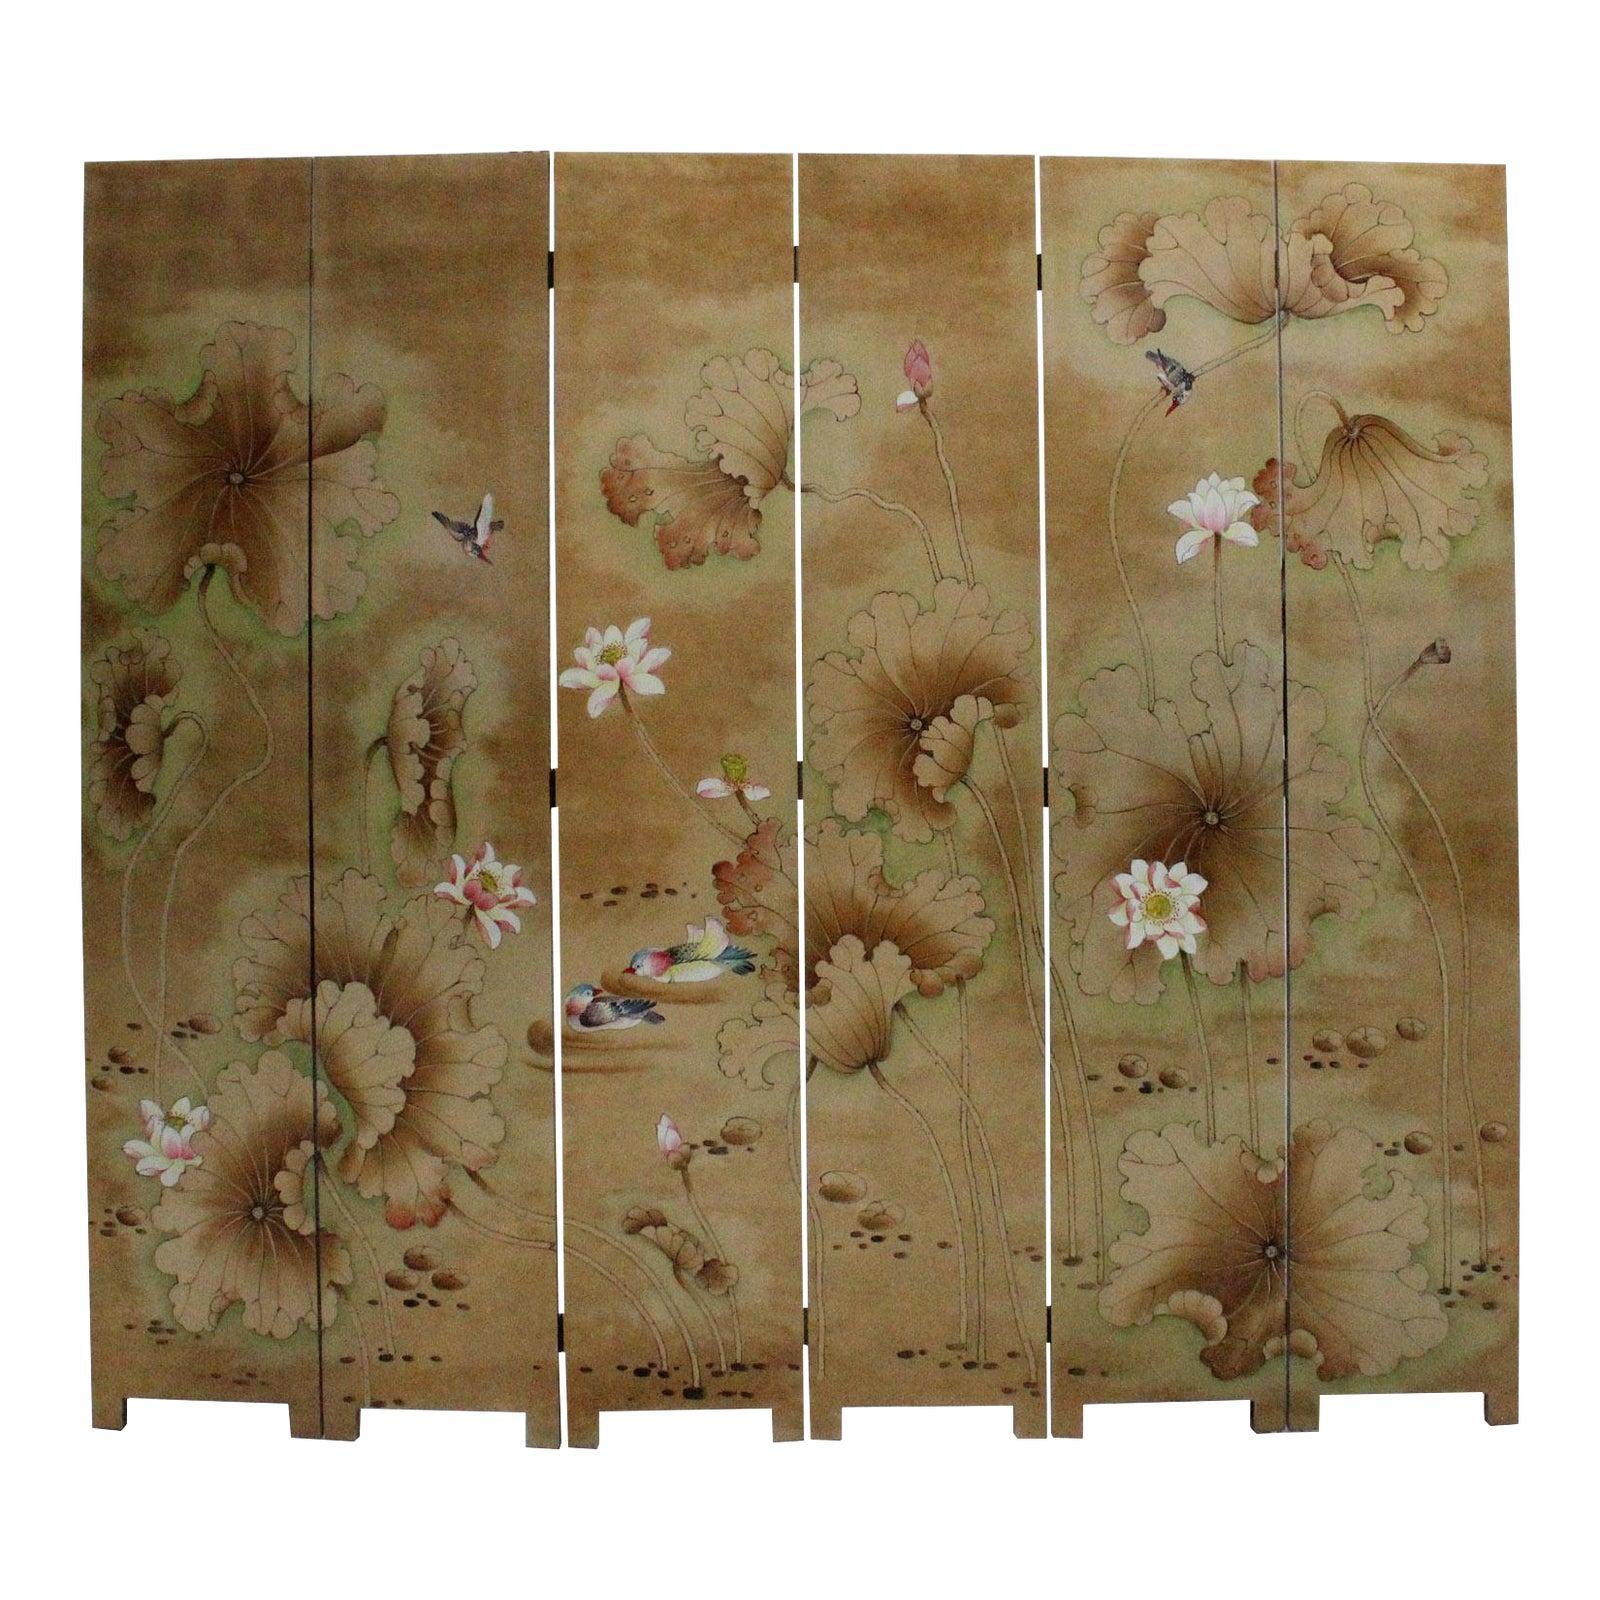 Chinese Golden Oriental Lotus Flower Birds Graphic Screen Chairish